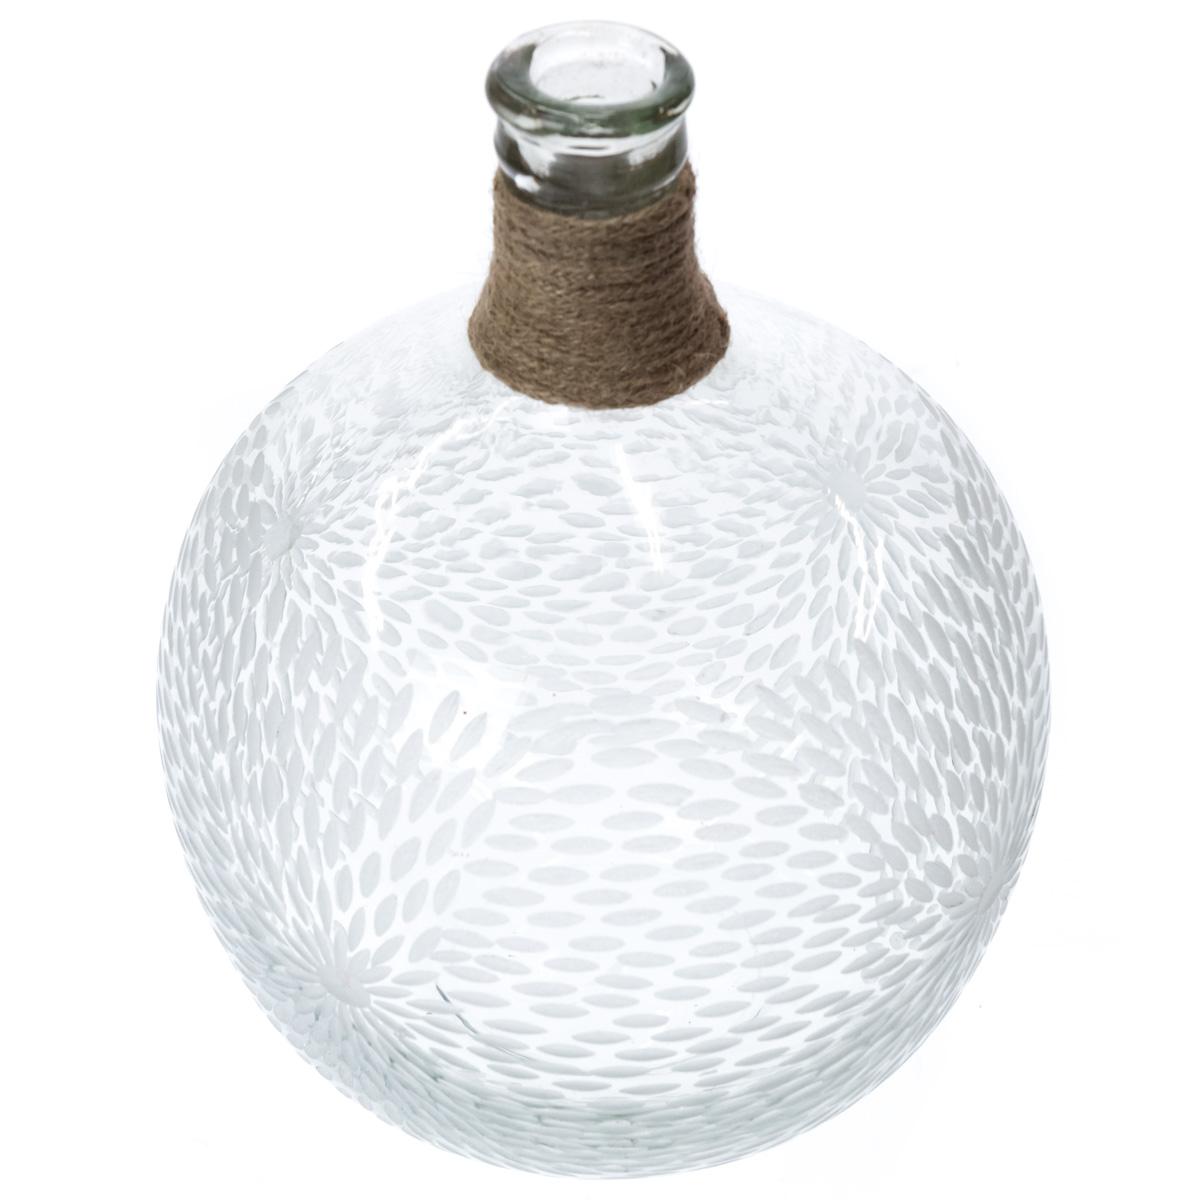 Etched Glass Vase